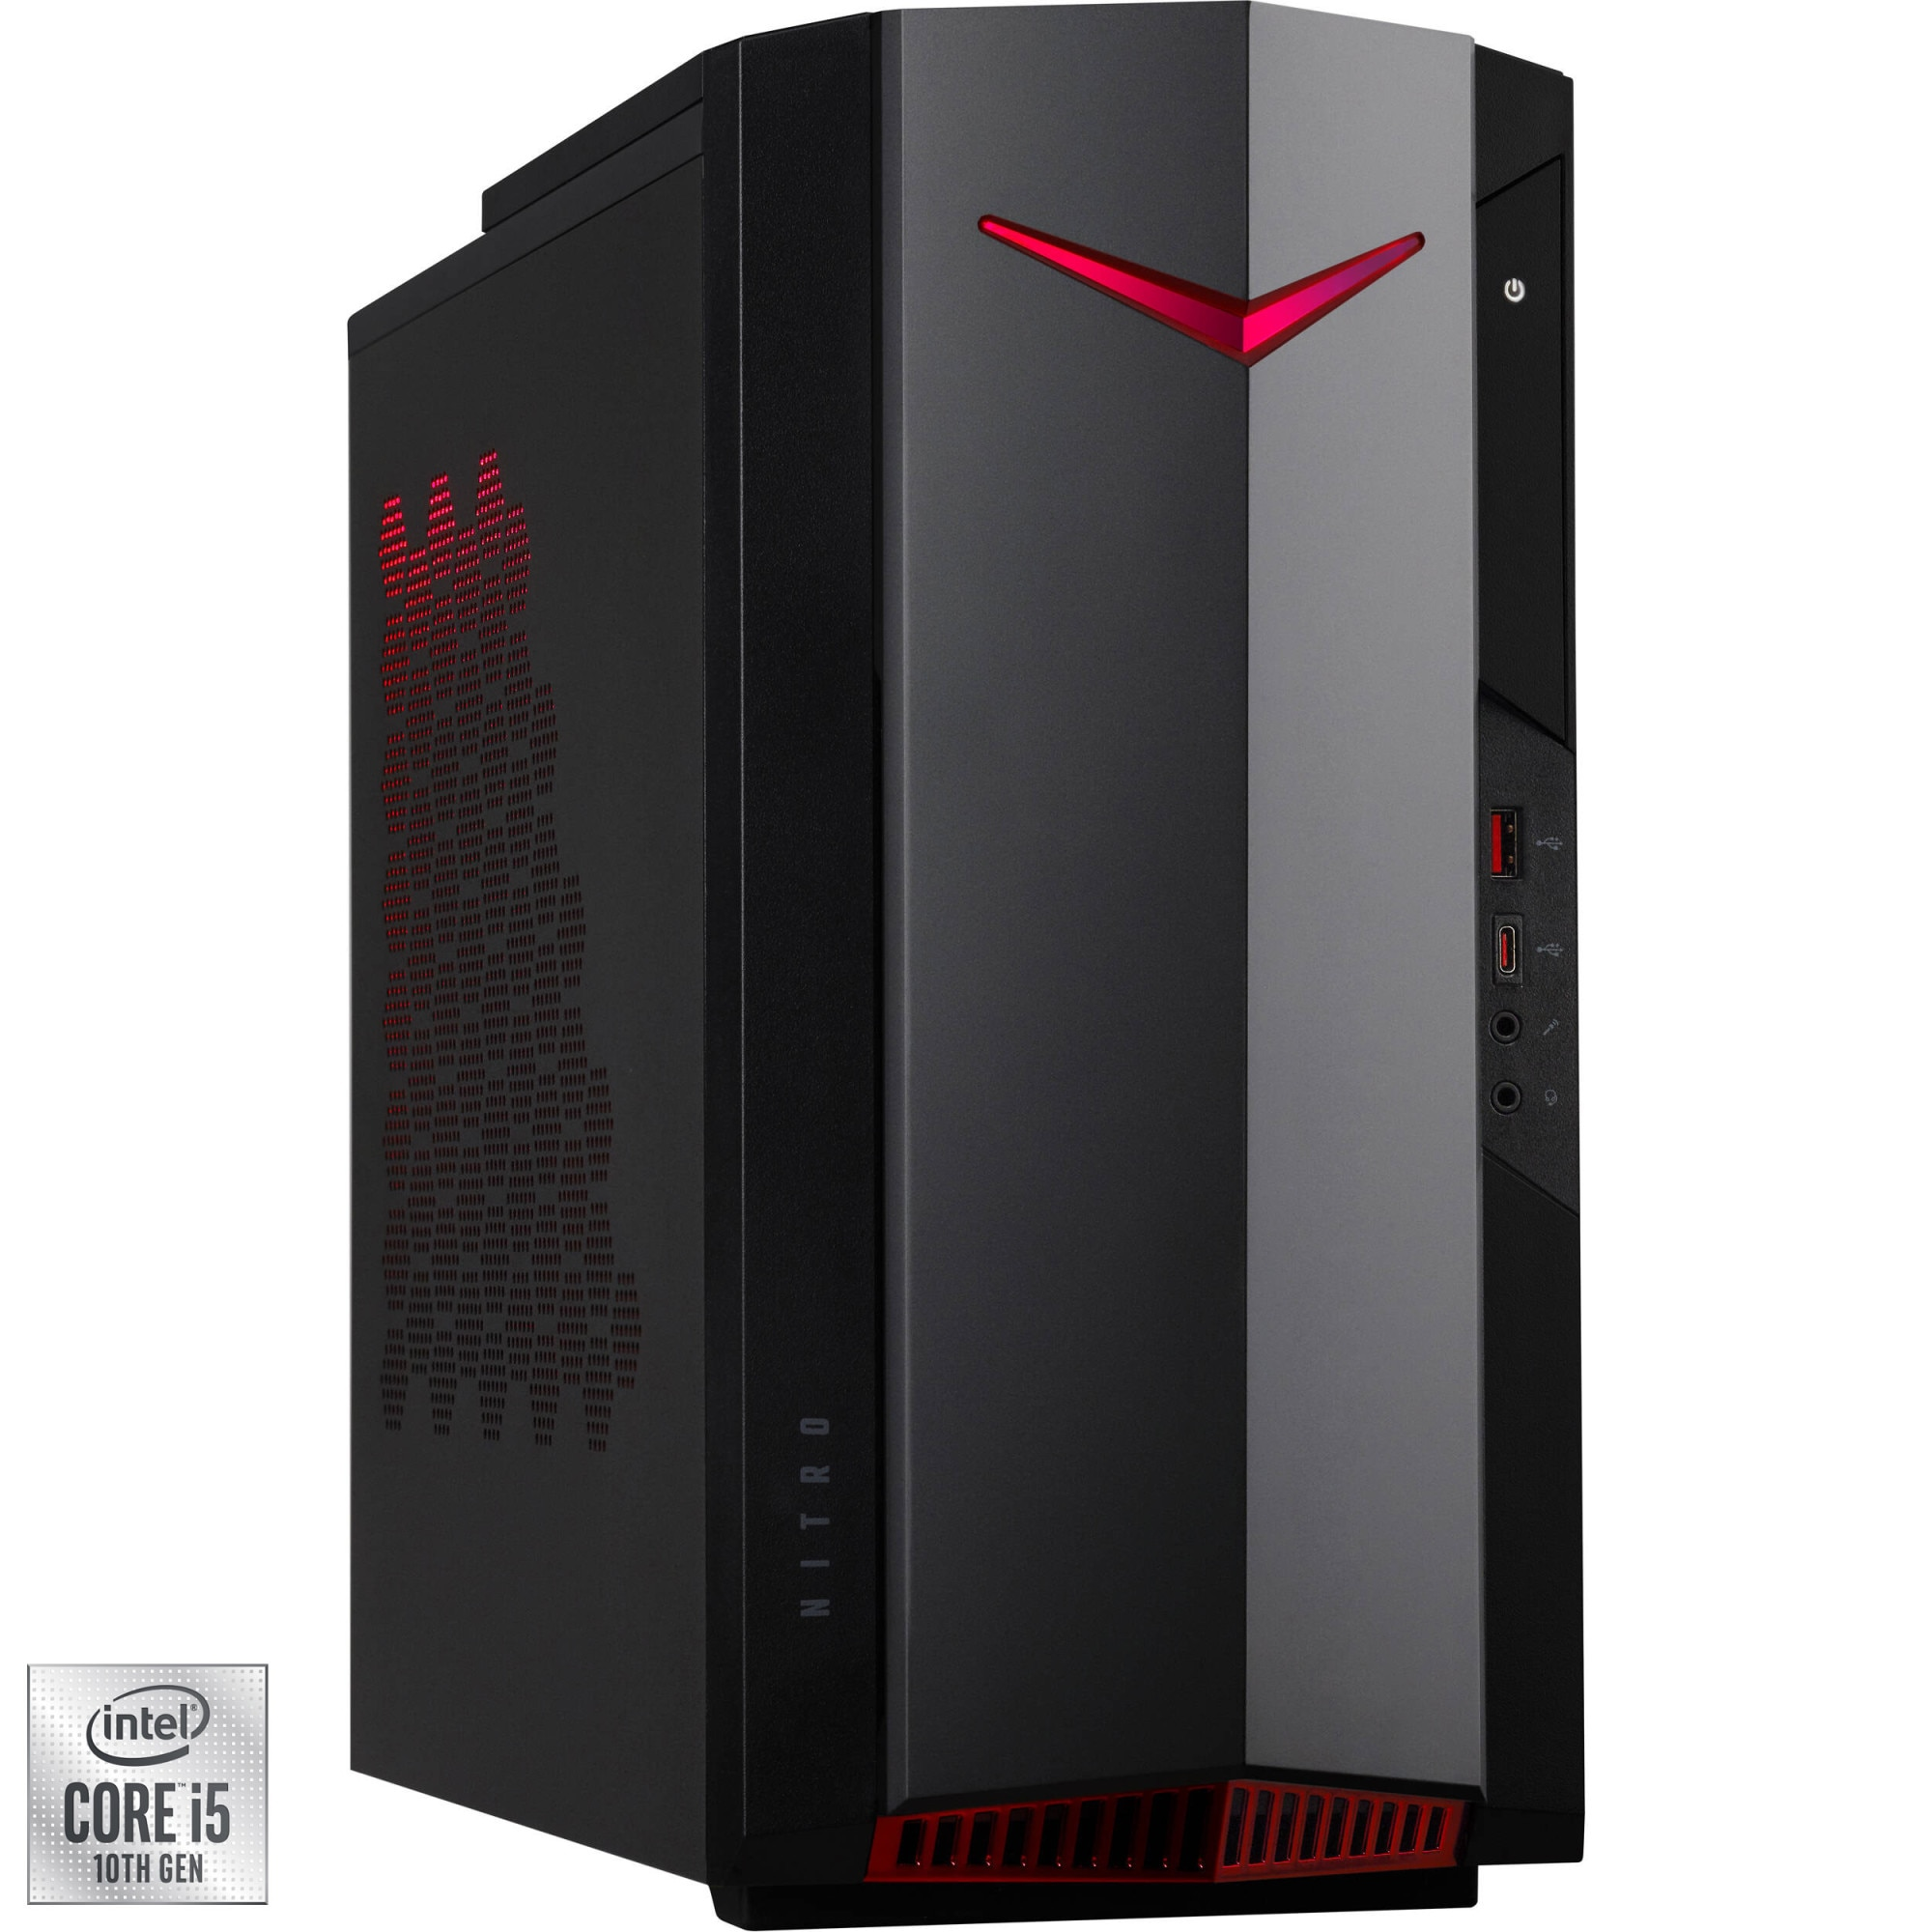 Fotografie Sistem Desktop PC Gaming Acer N50-610 cu procesor Intel® Core™ i5-10400F pana la 4.30GHz, 16GB DDR4, 512GB SSD, Wi-Fi 6, NVIDIA® GeForce® GTX 1660 Super™ 6GB, No OS